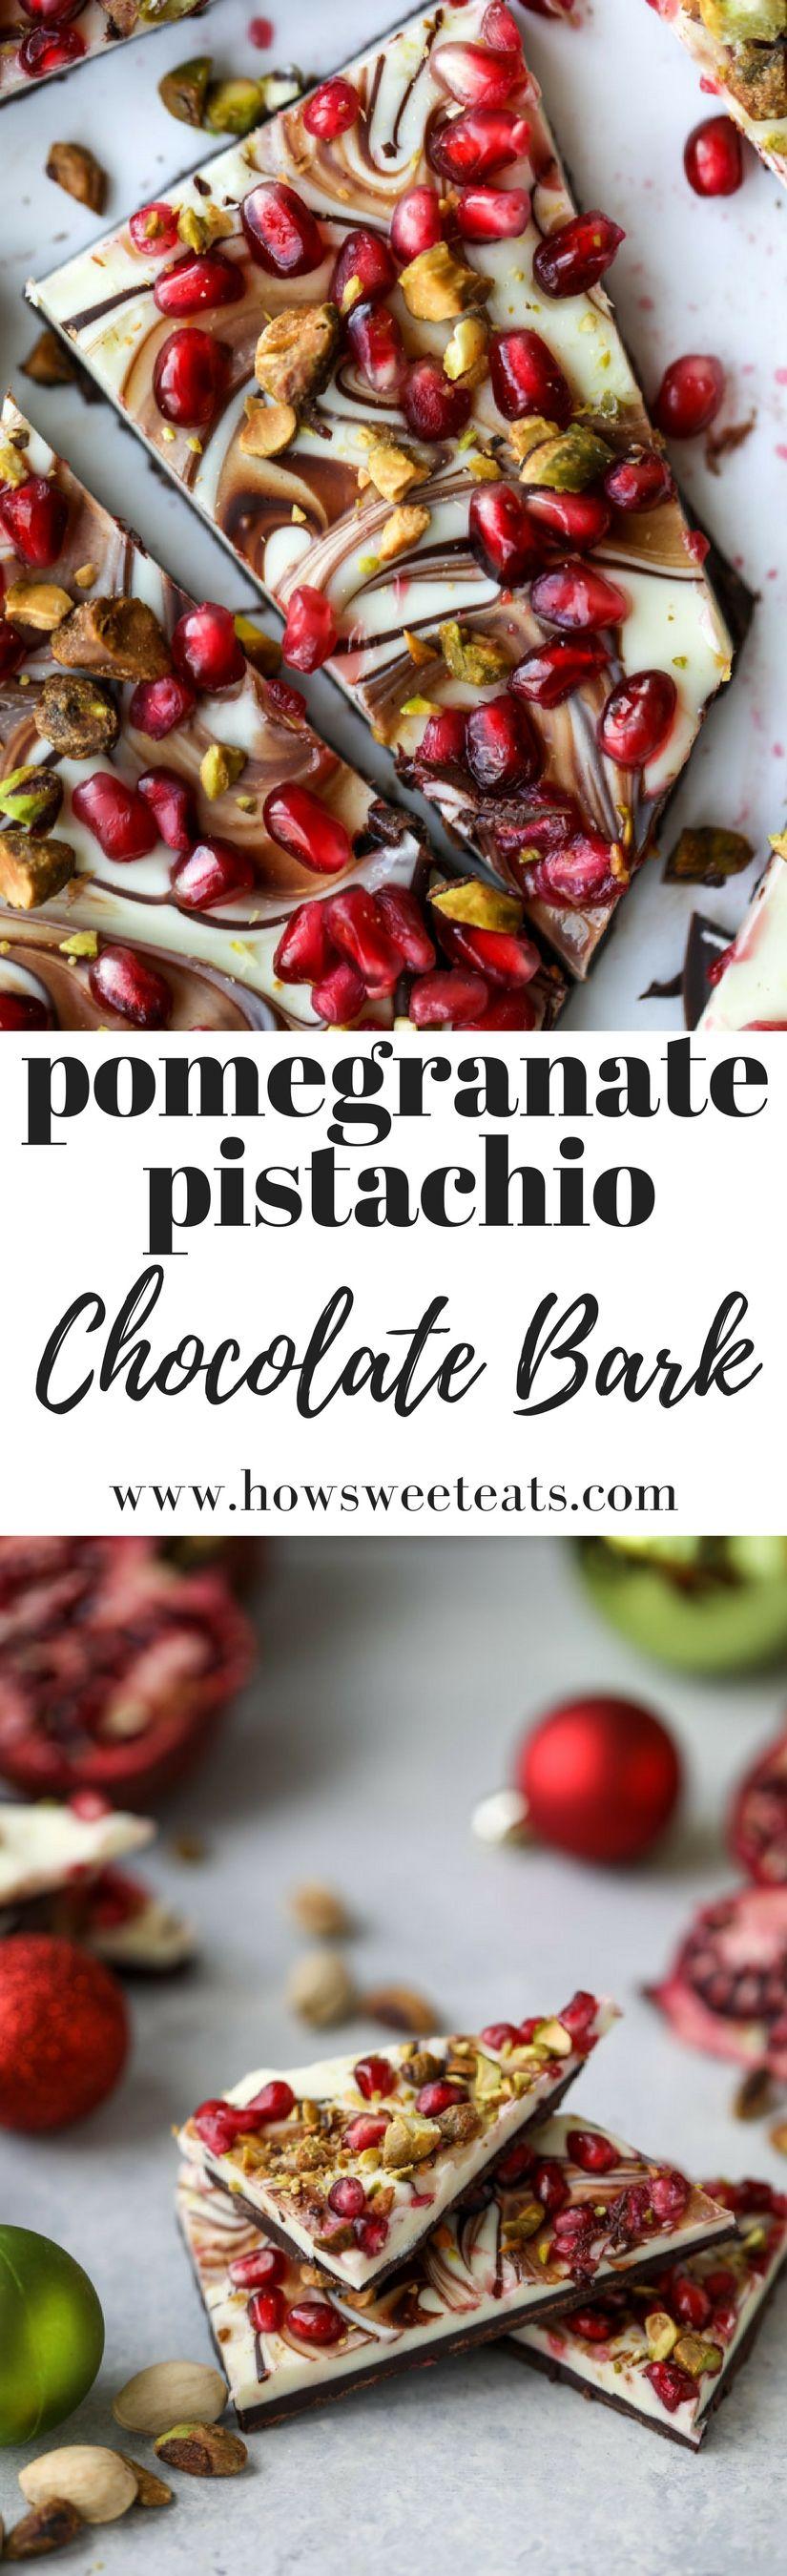 Pomegranate Pistachio Swirled Chocolate Bark